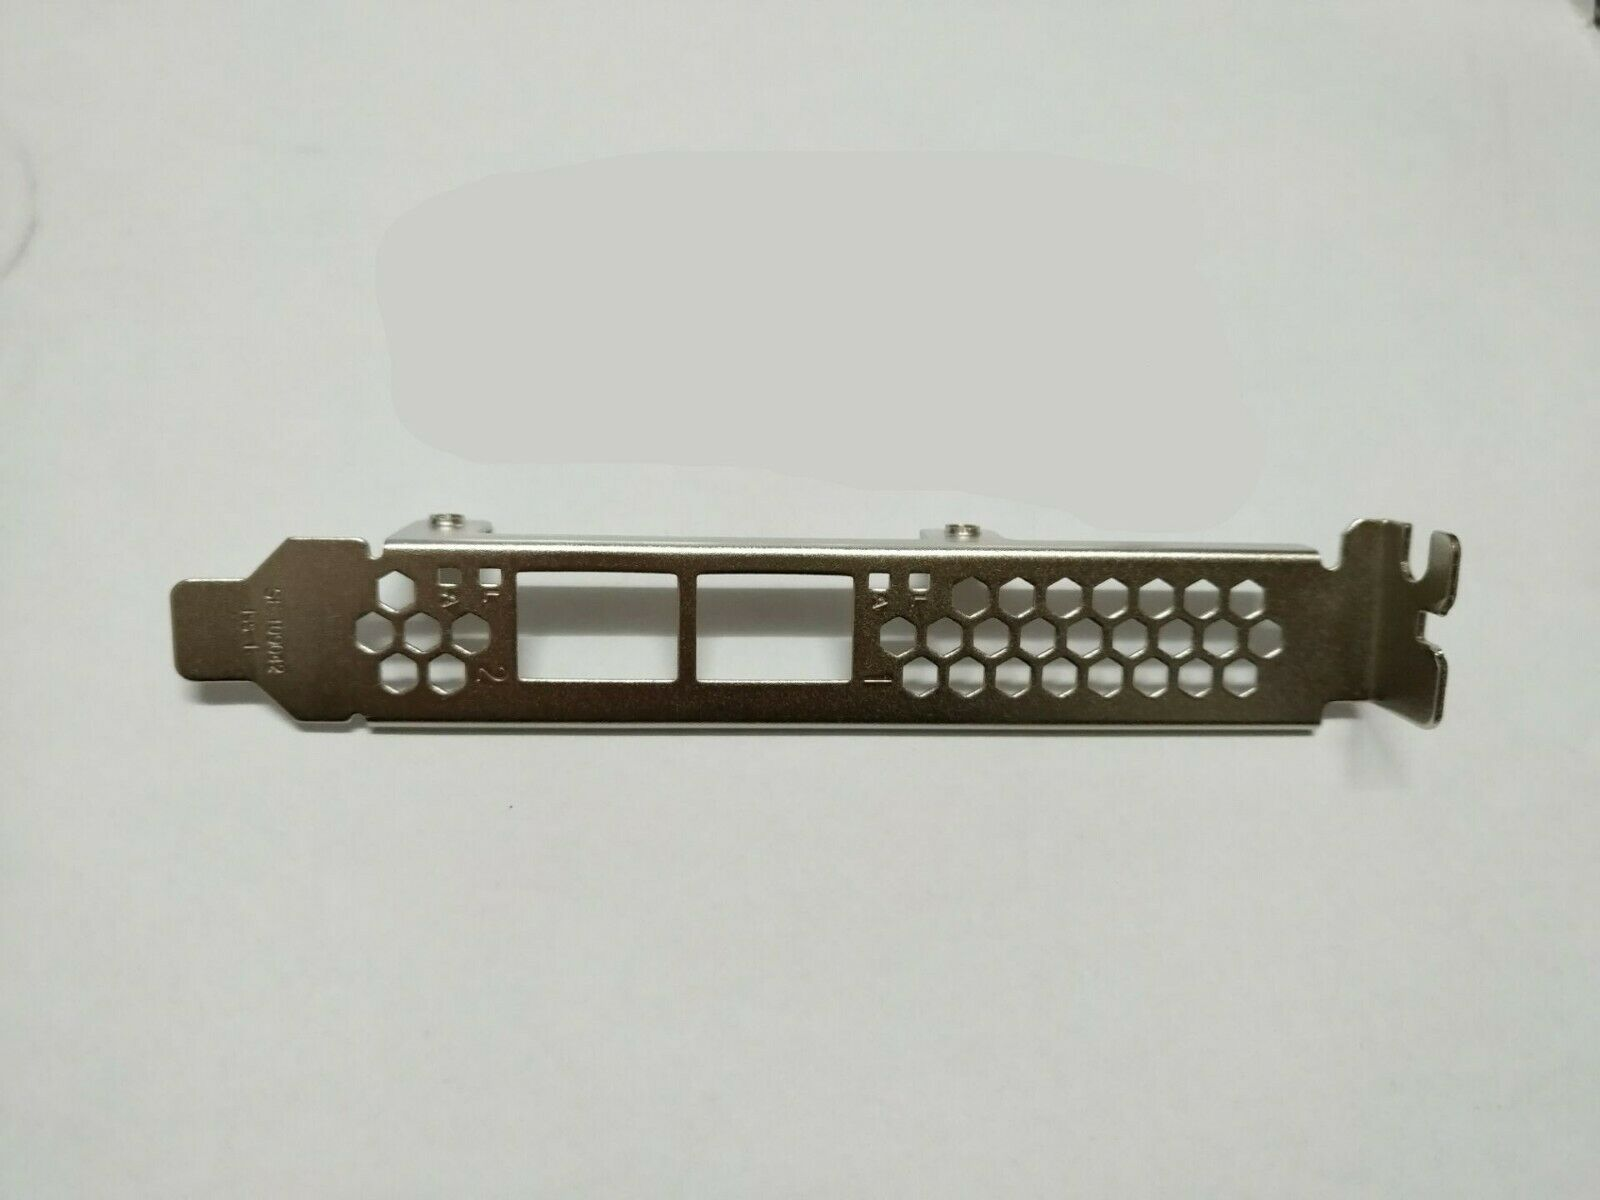 Solarflare network card full height bracket SFN8522, X2522 port card SF-109042